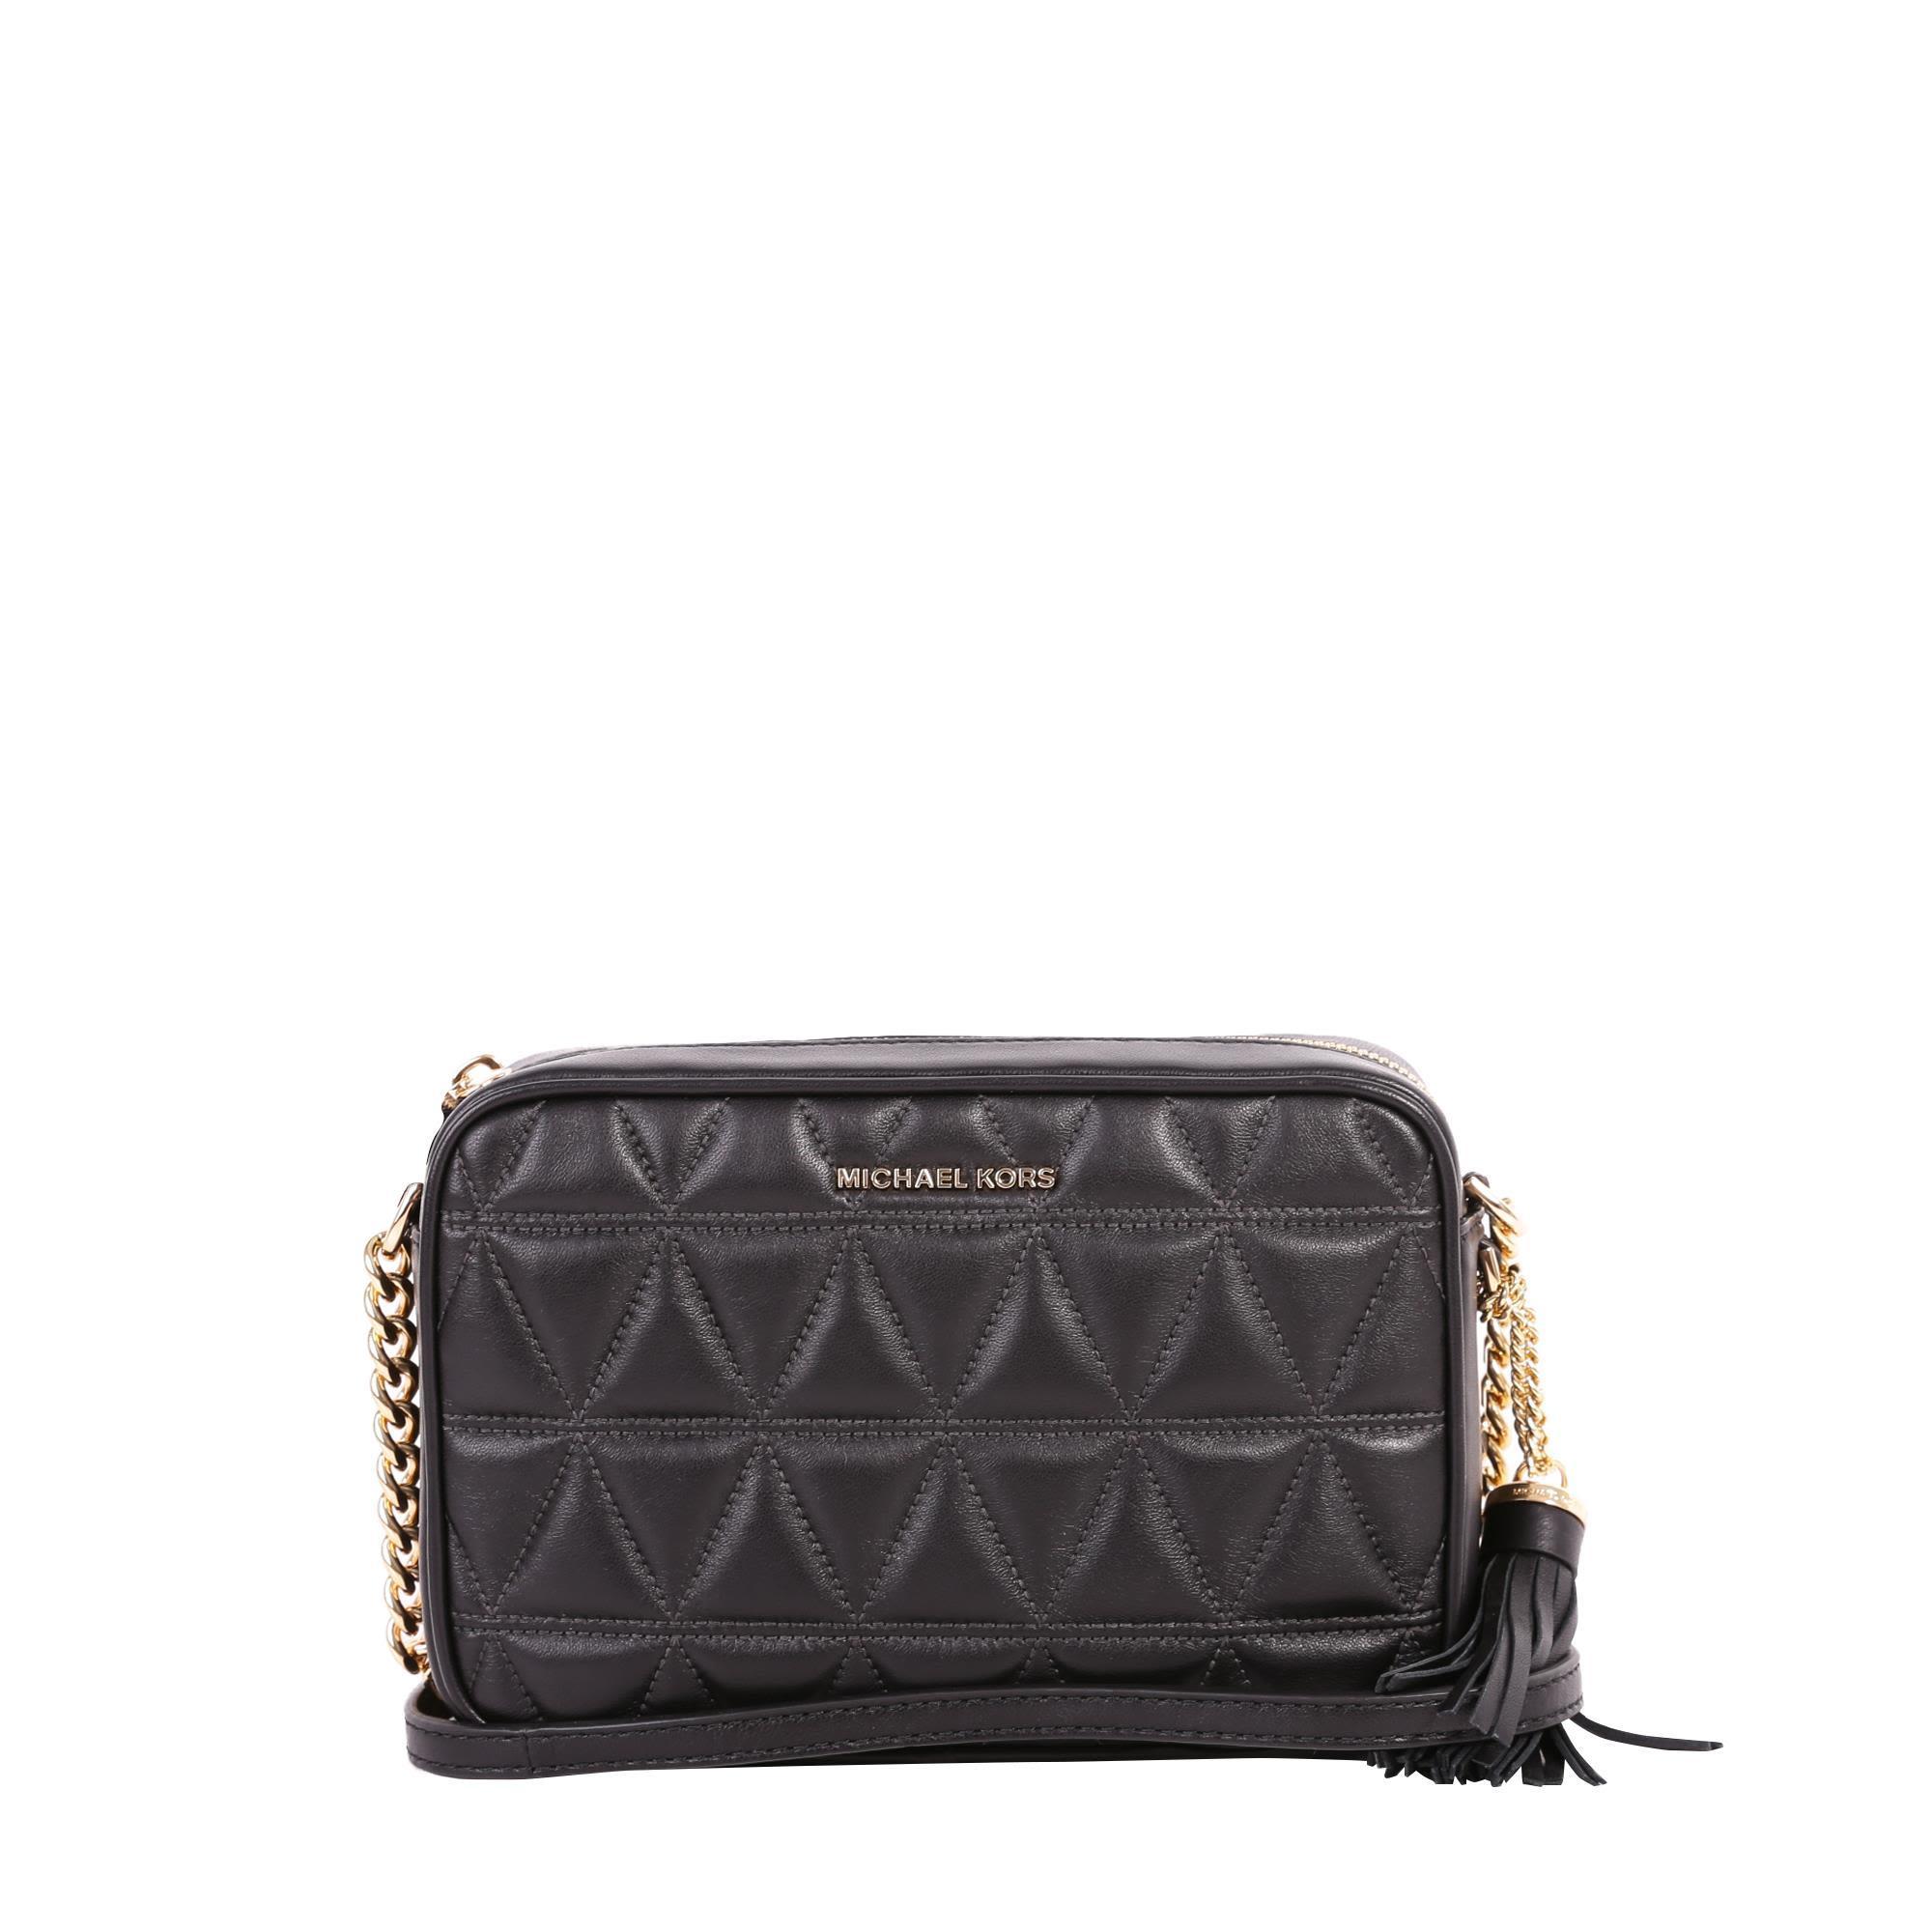 Michael Michael Kors Ginny Leather Bag In Black